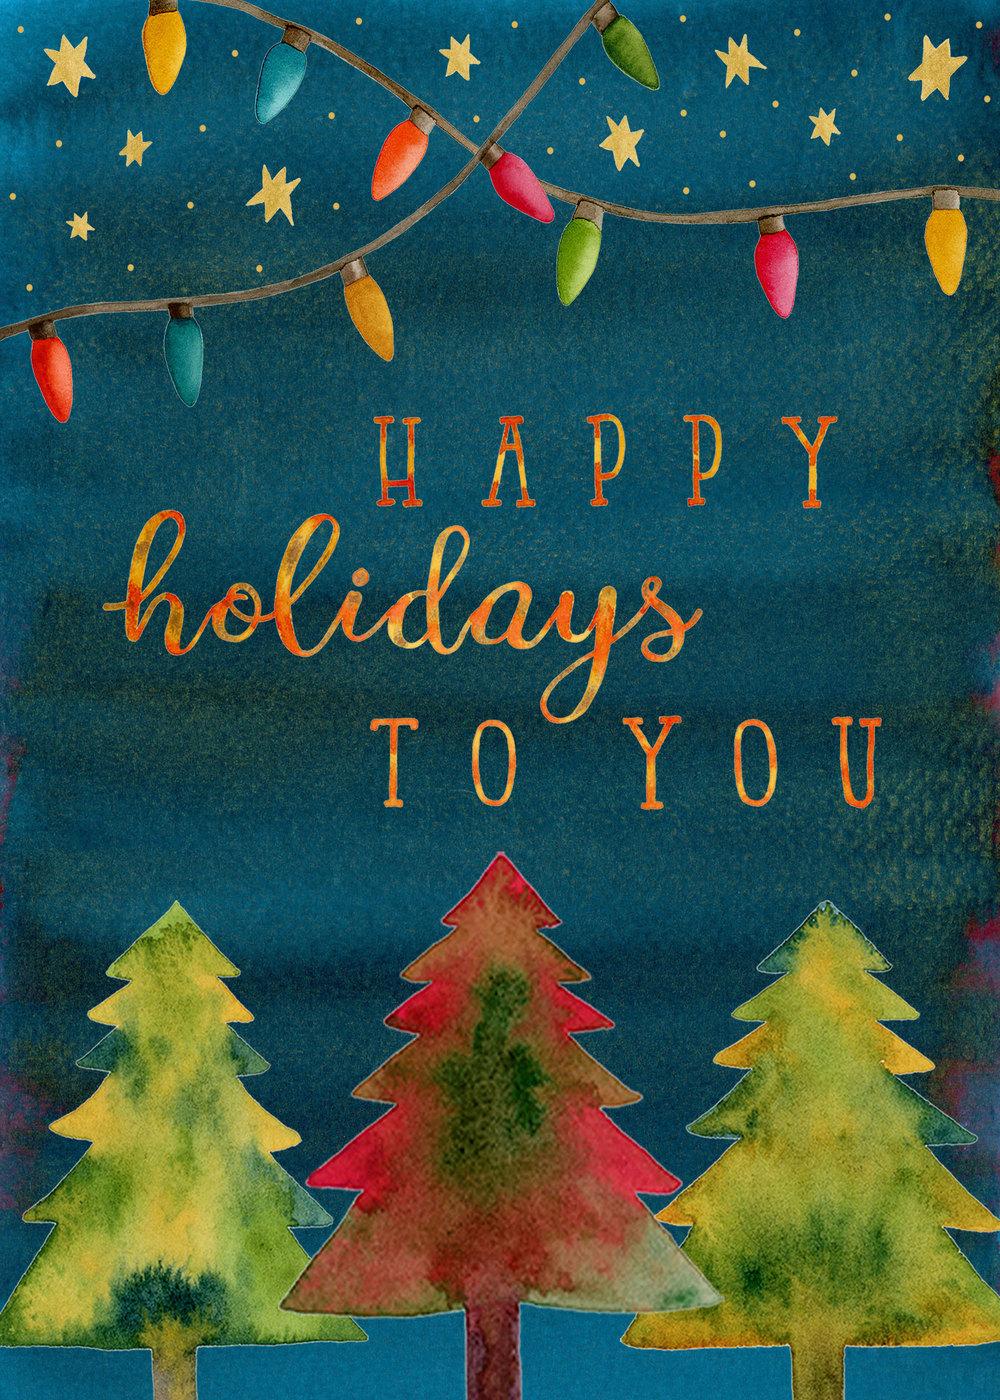 moonandskyenightchristmascardweb.jpg